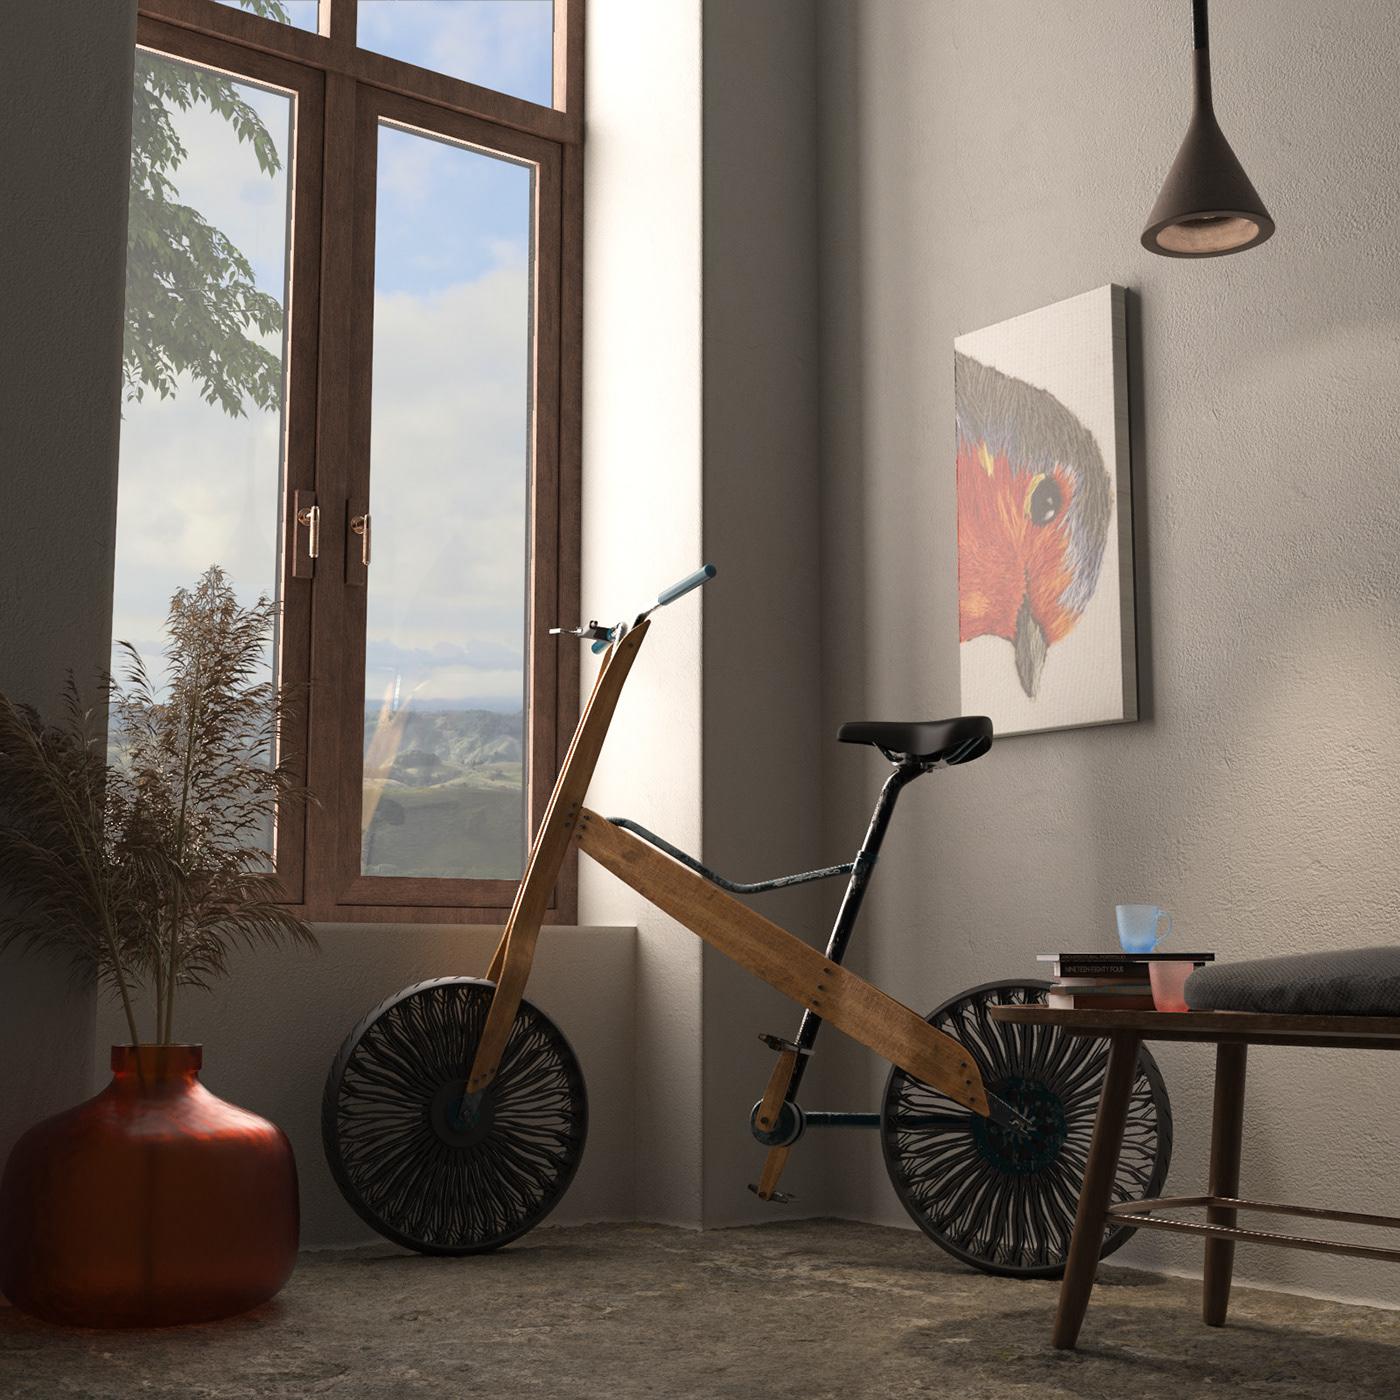 Bike RTA bamboo Urban design concept transportation Bicycle wood eco